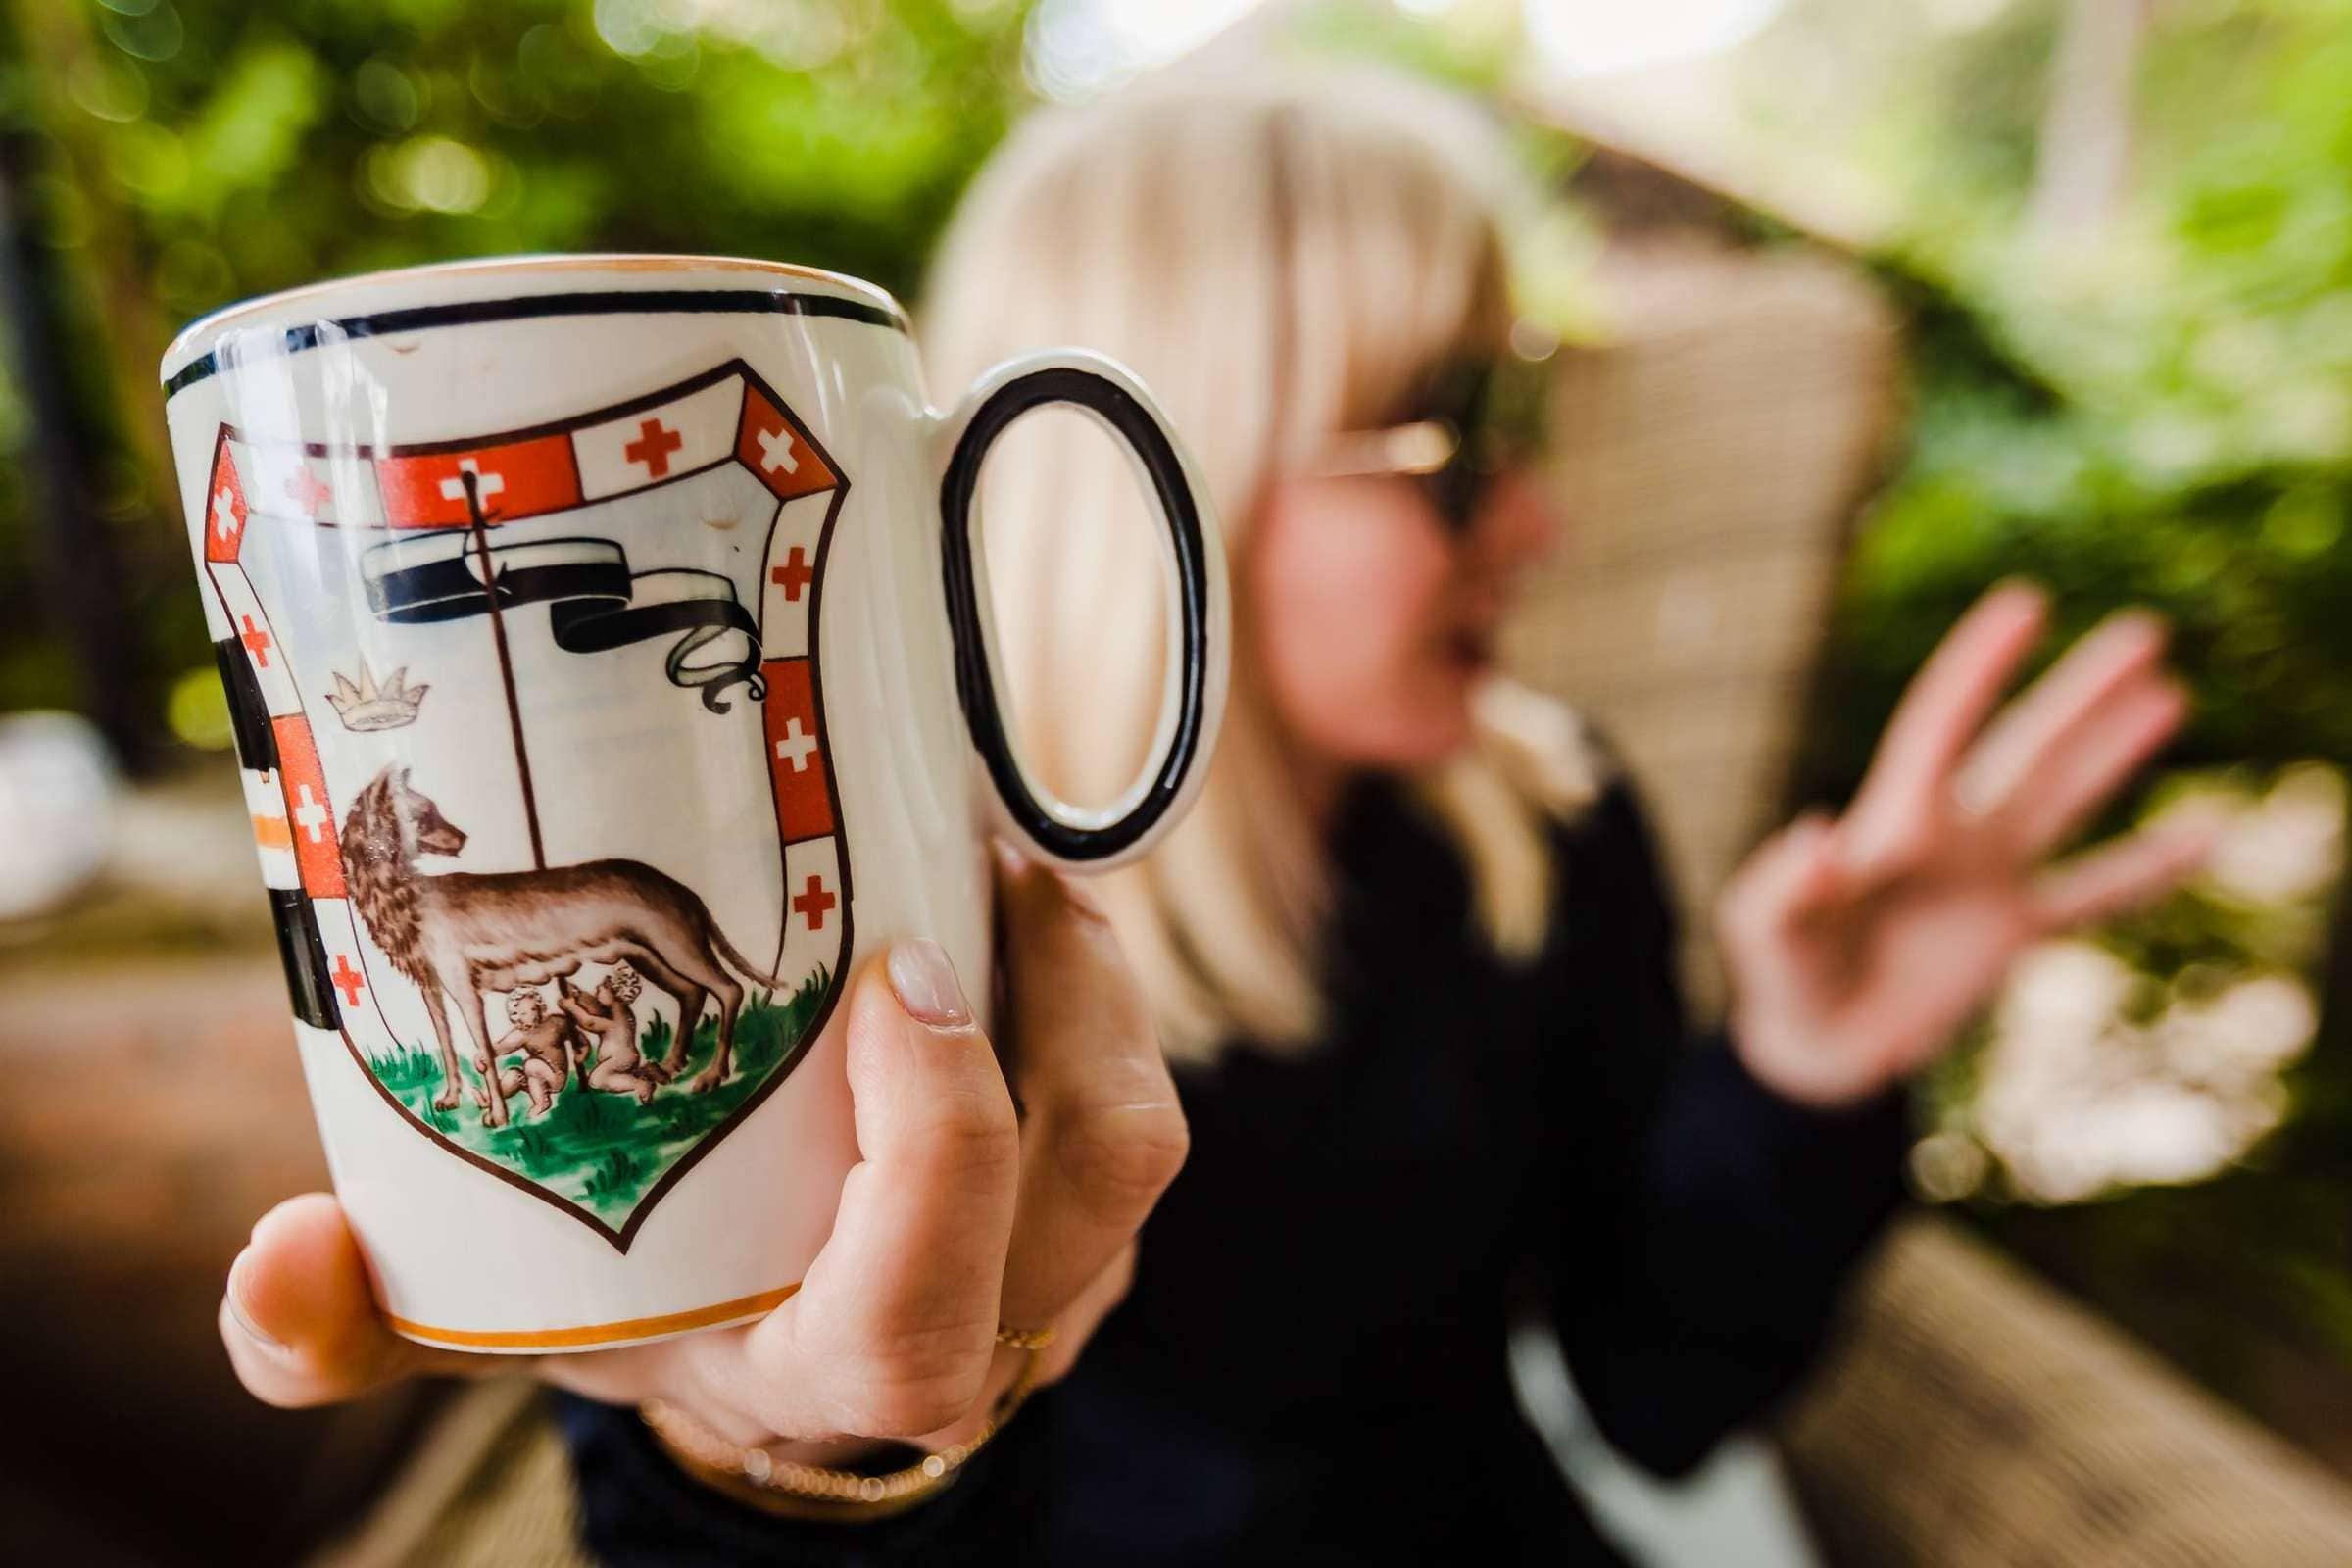 Guests enjoying morning coffee during a Villa Tre Grazie wedding celebration near Todi, Italy.